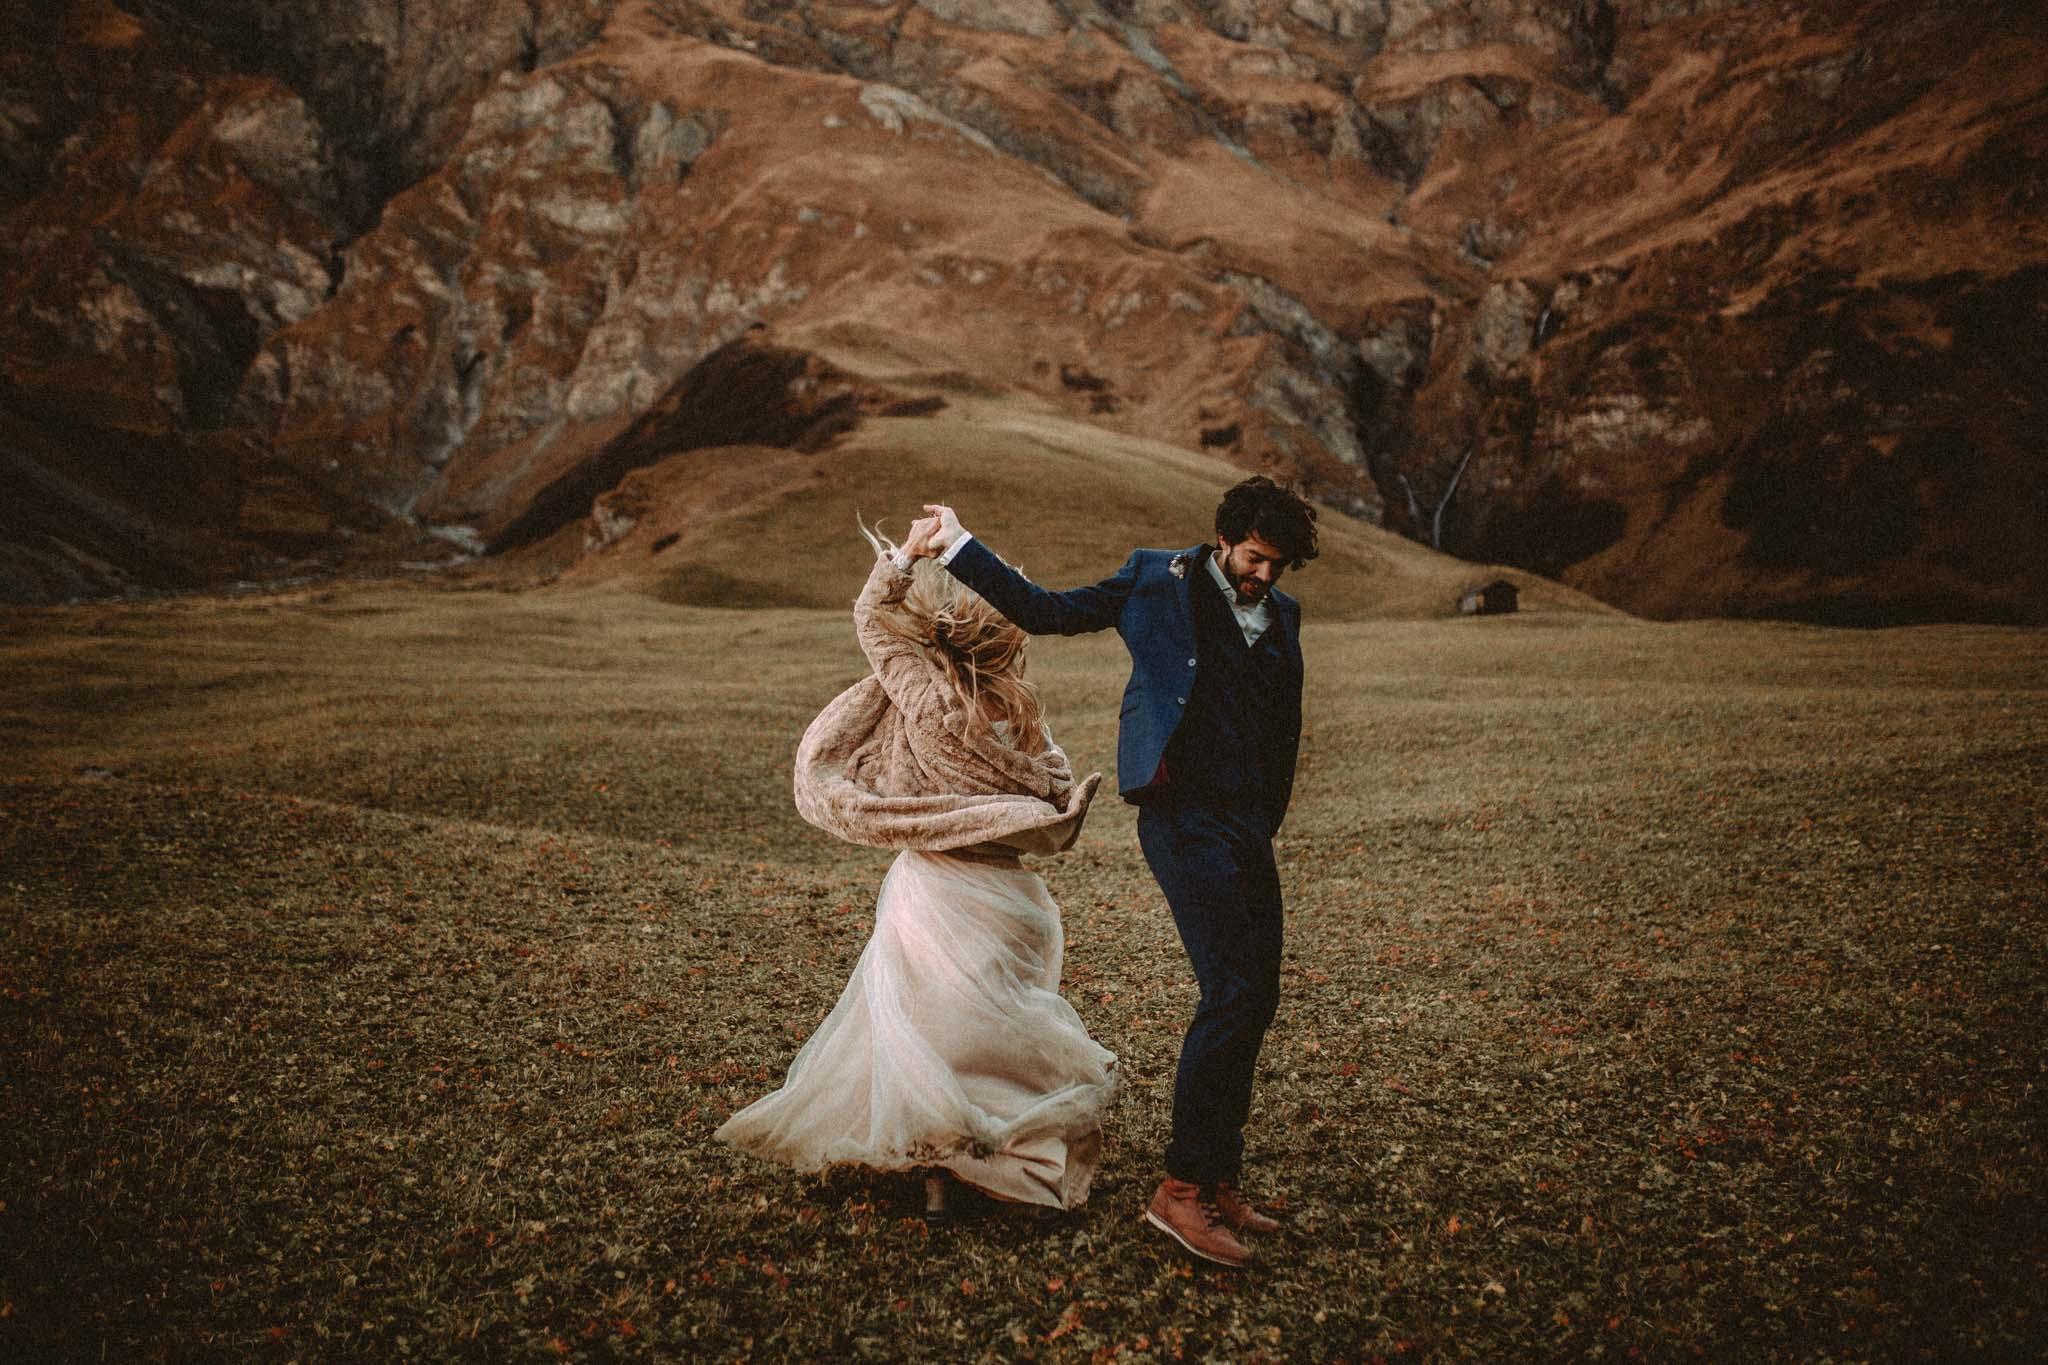 fine art wedding photography from Berlin